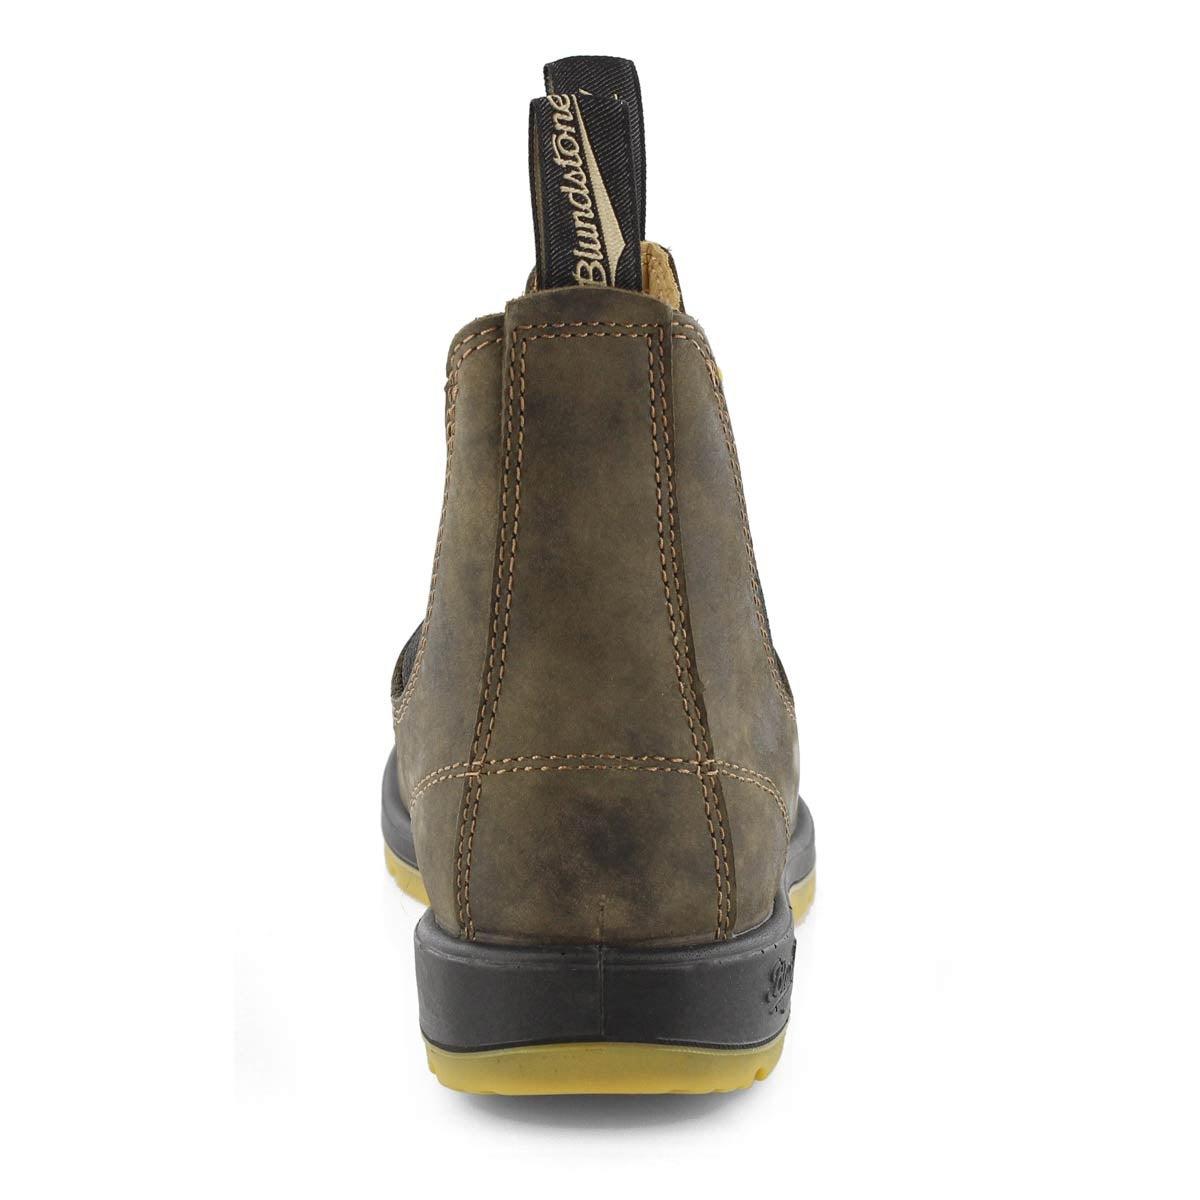 Botte LeatherLined, brn rstq, unisexe